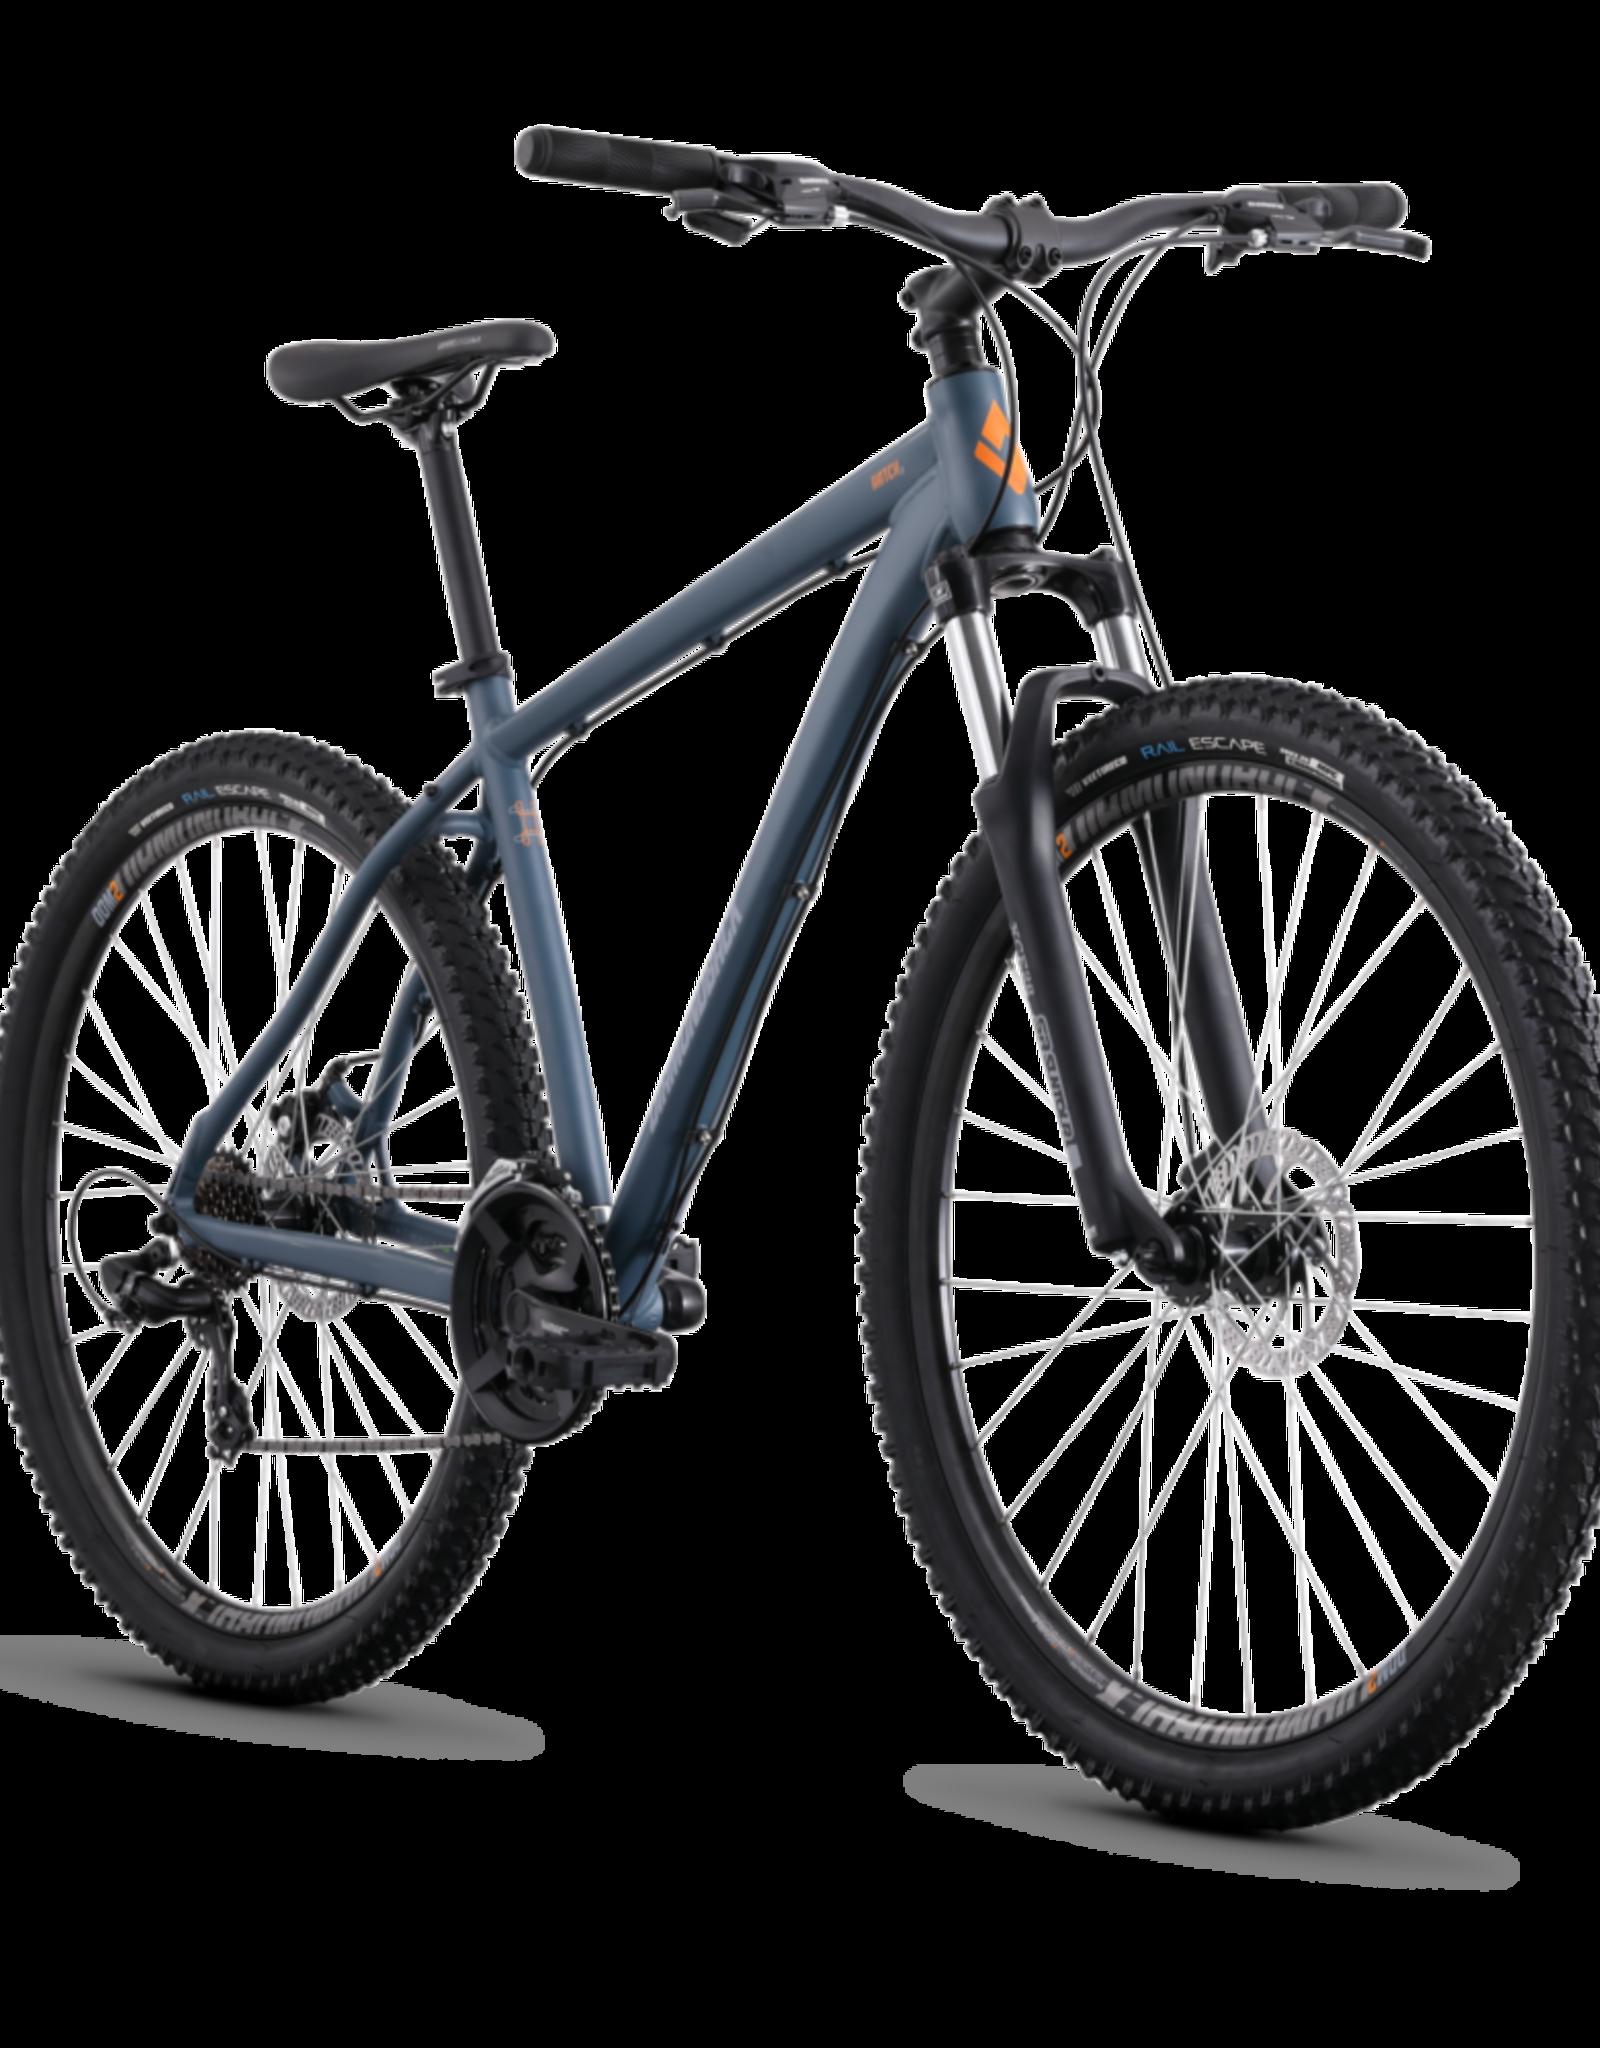 2021 Diamondback Hatch 2 Trail Bike, Mechanical Disc